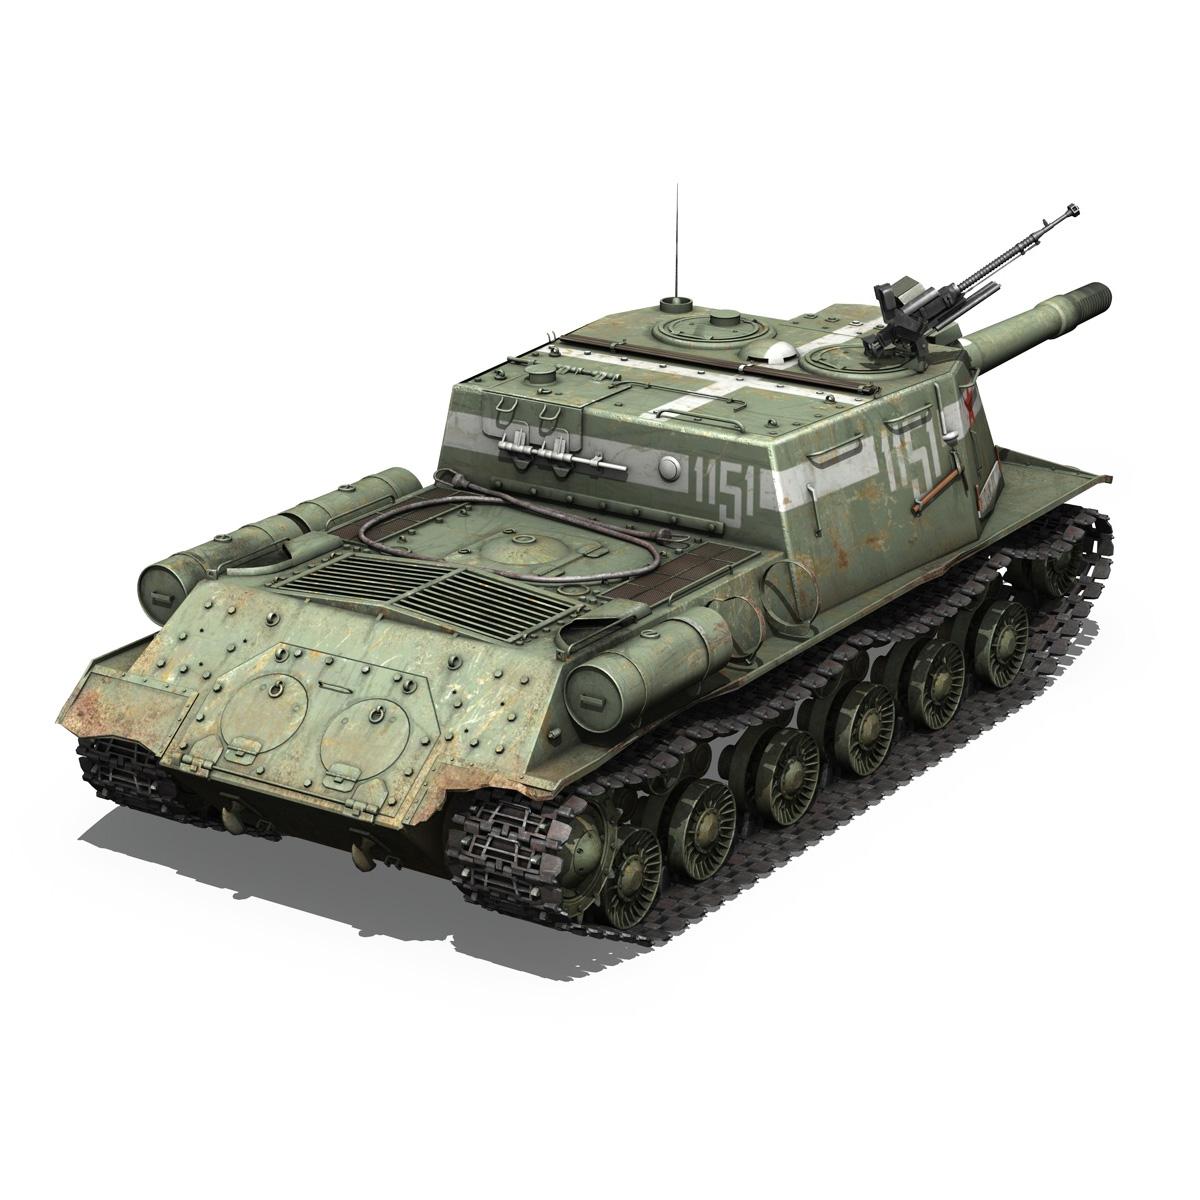 isu 152 soviet heavy self propelled gun 3d model 3ds fbx c4d lwo obj 187530